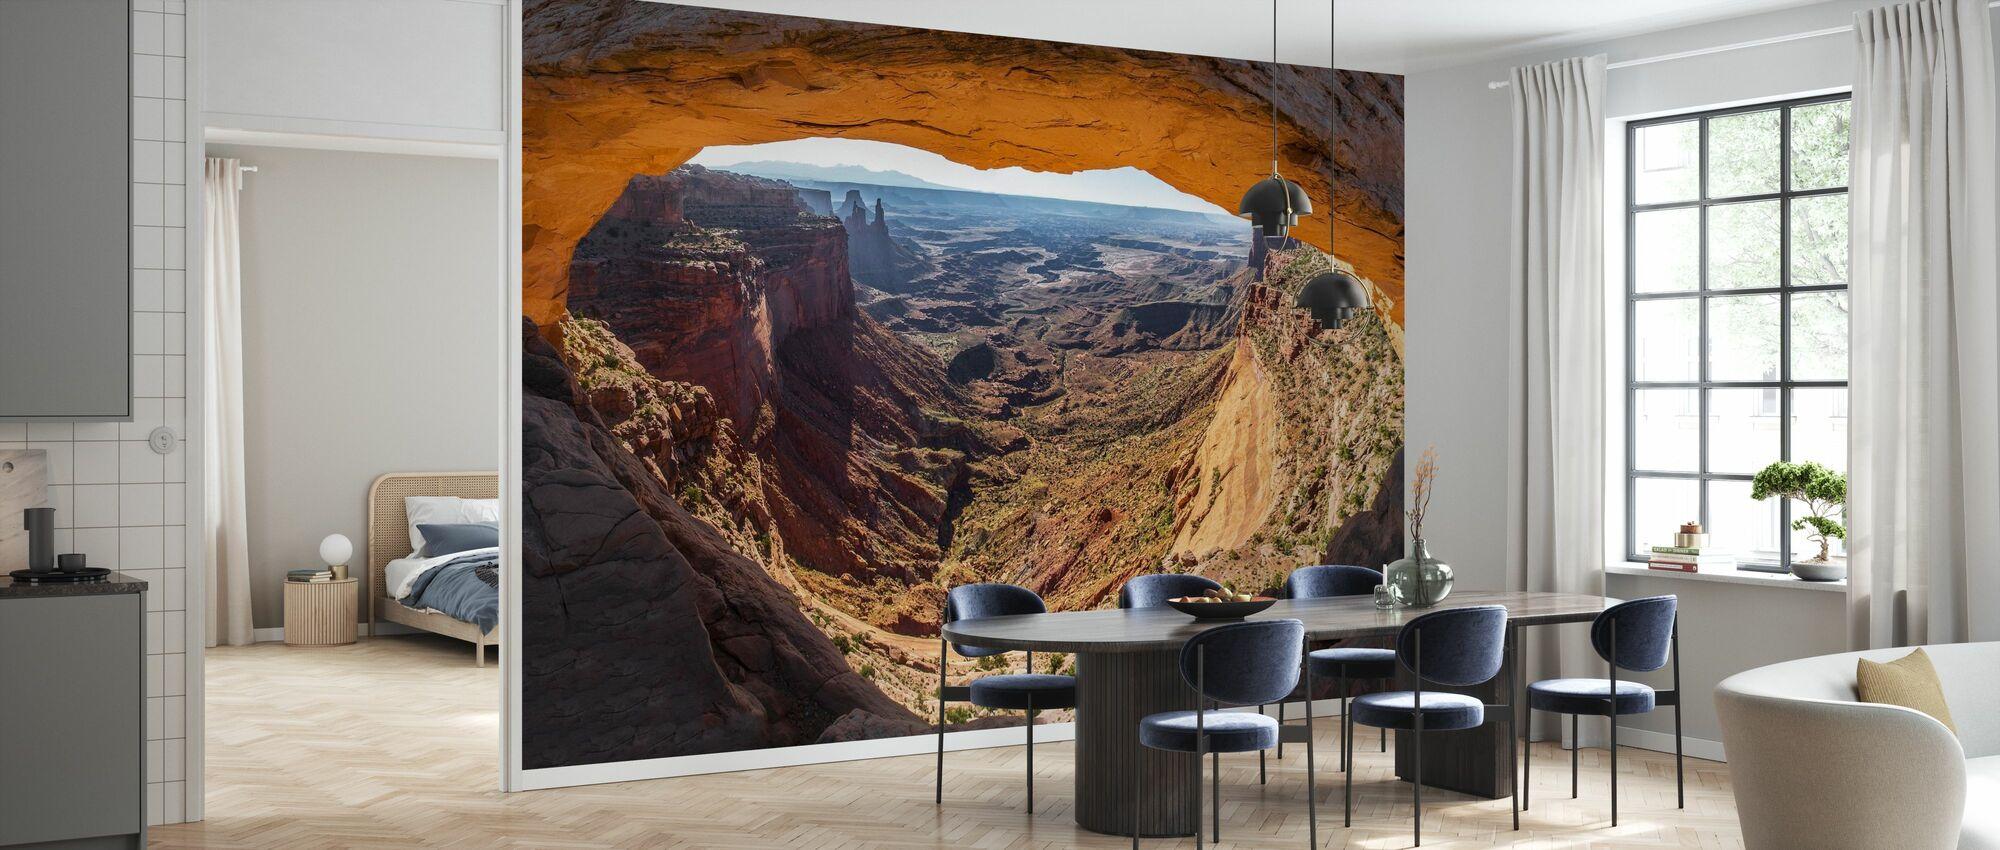 Mesa Arch - Wallpaper - Kitchen